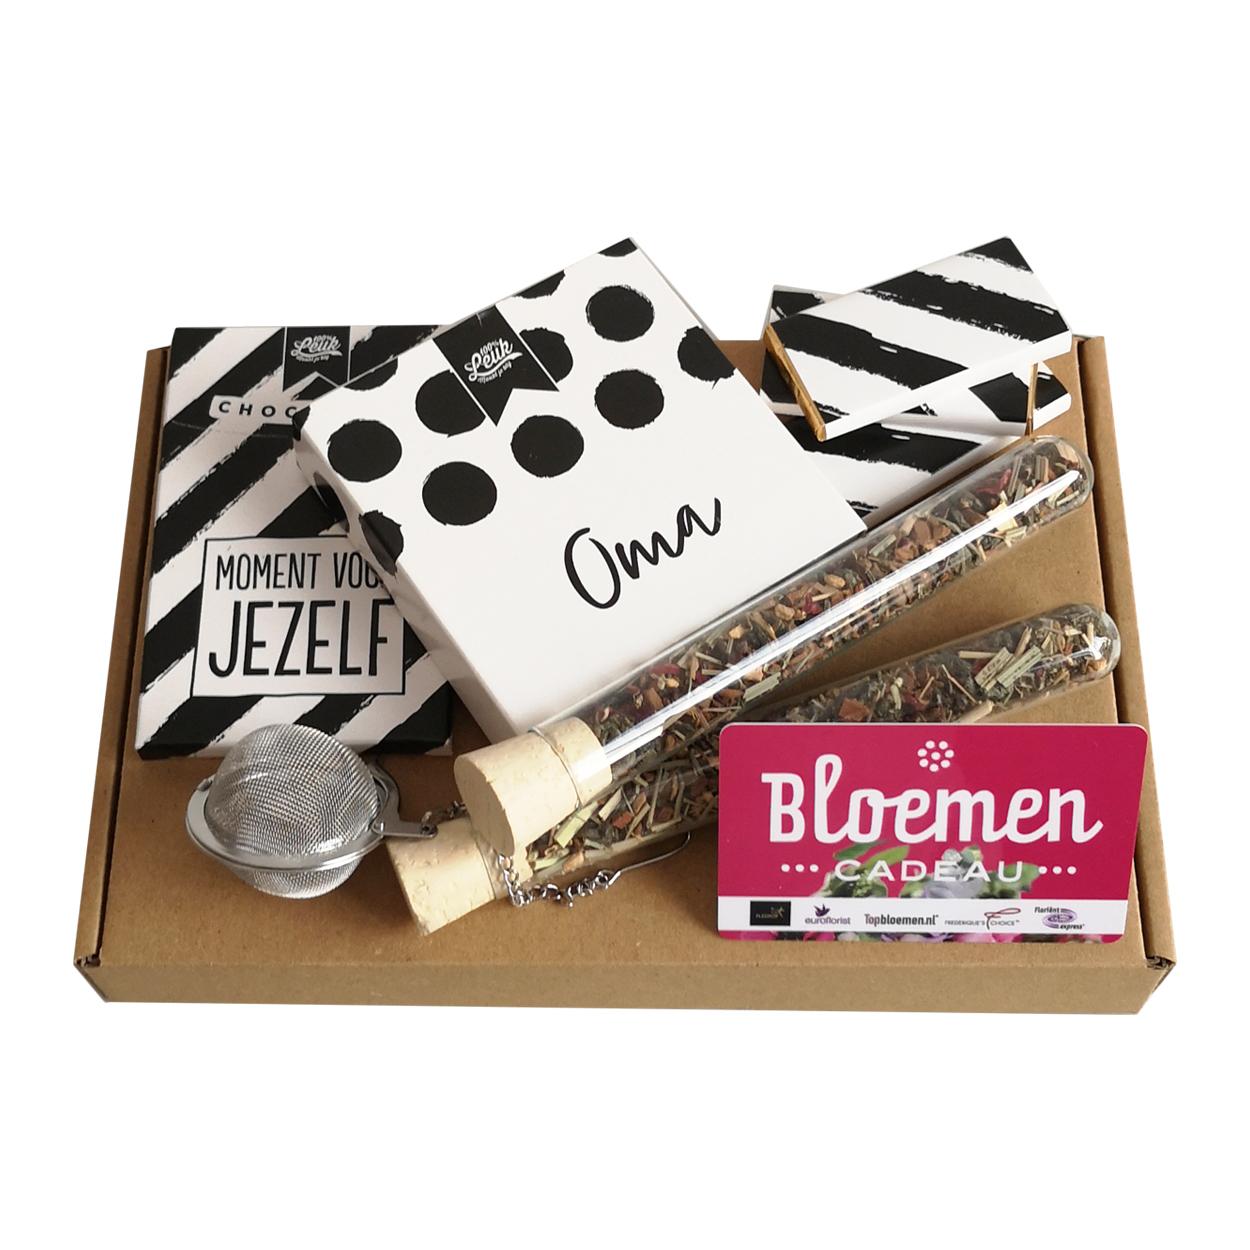 Bloem Cadeau 15 Euro 100leuk Door De Brievenbus Oma